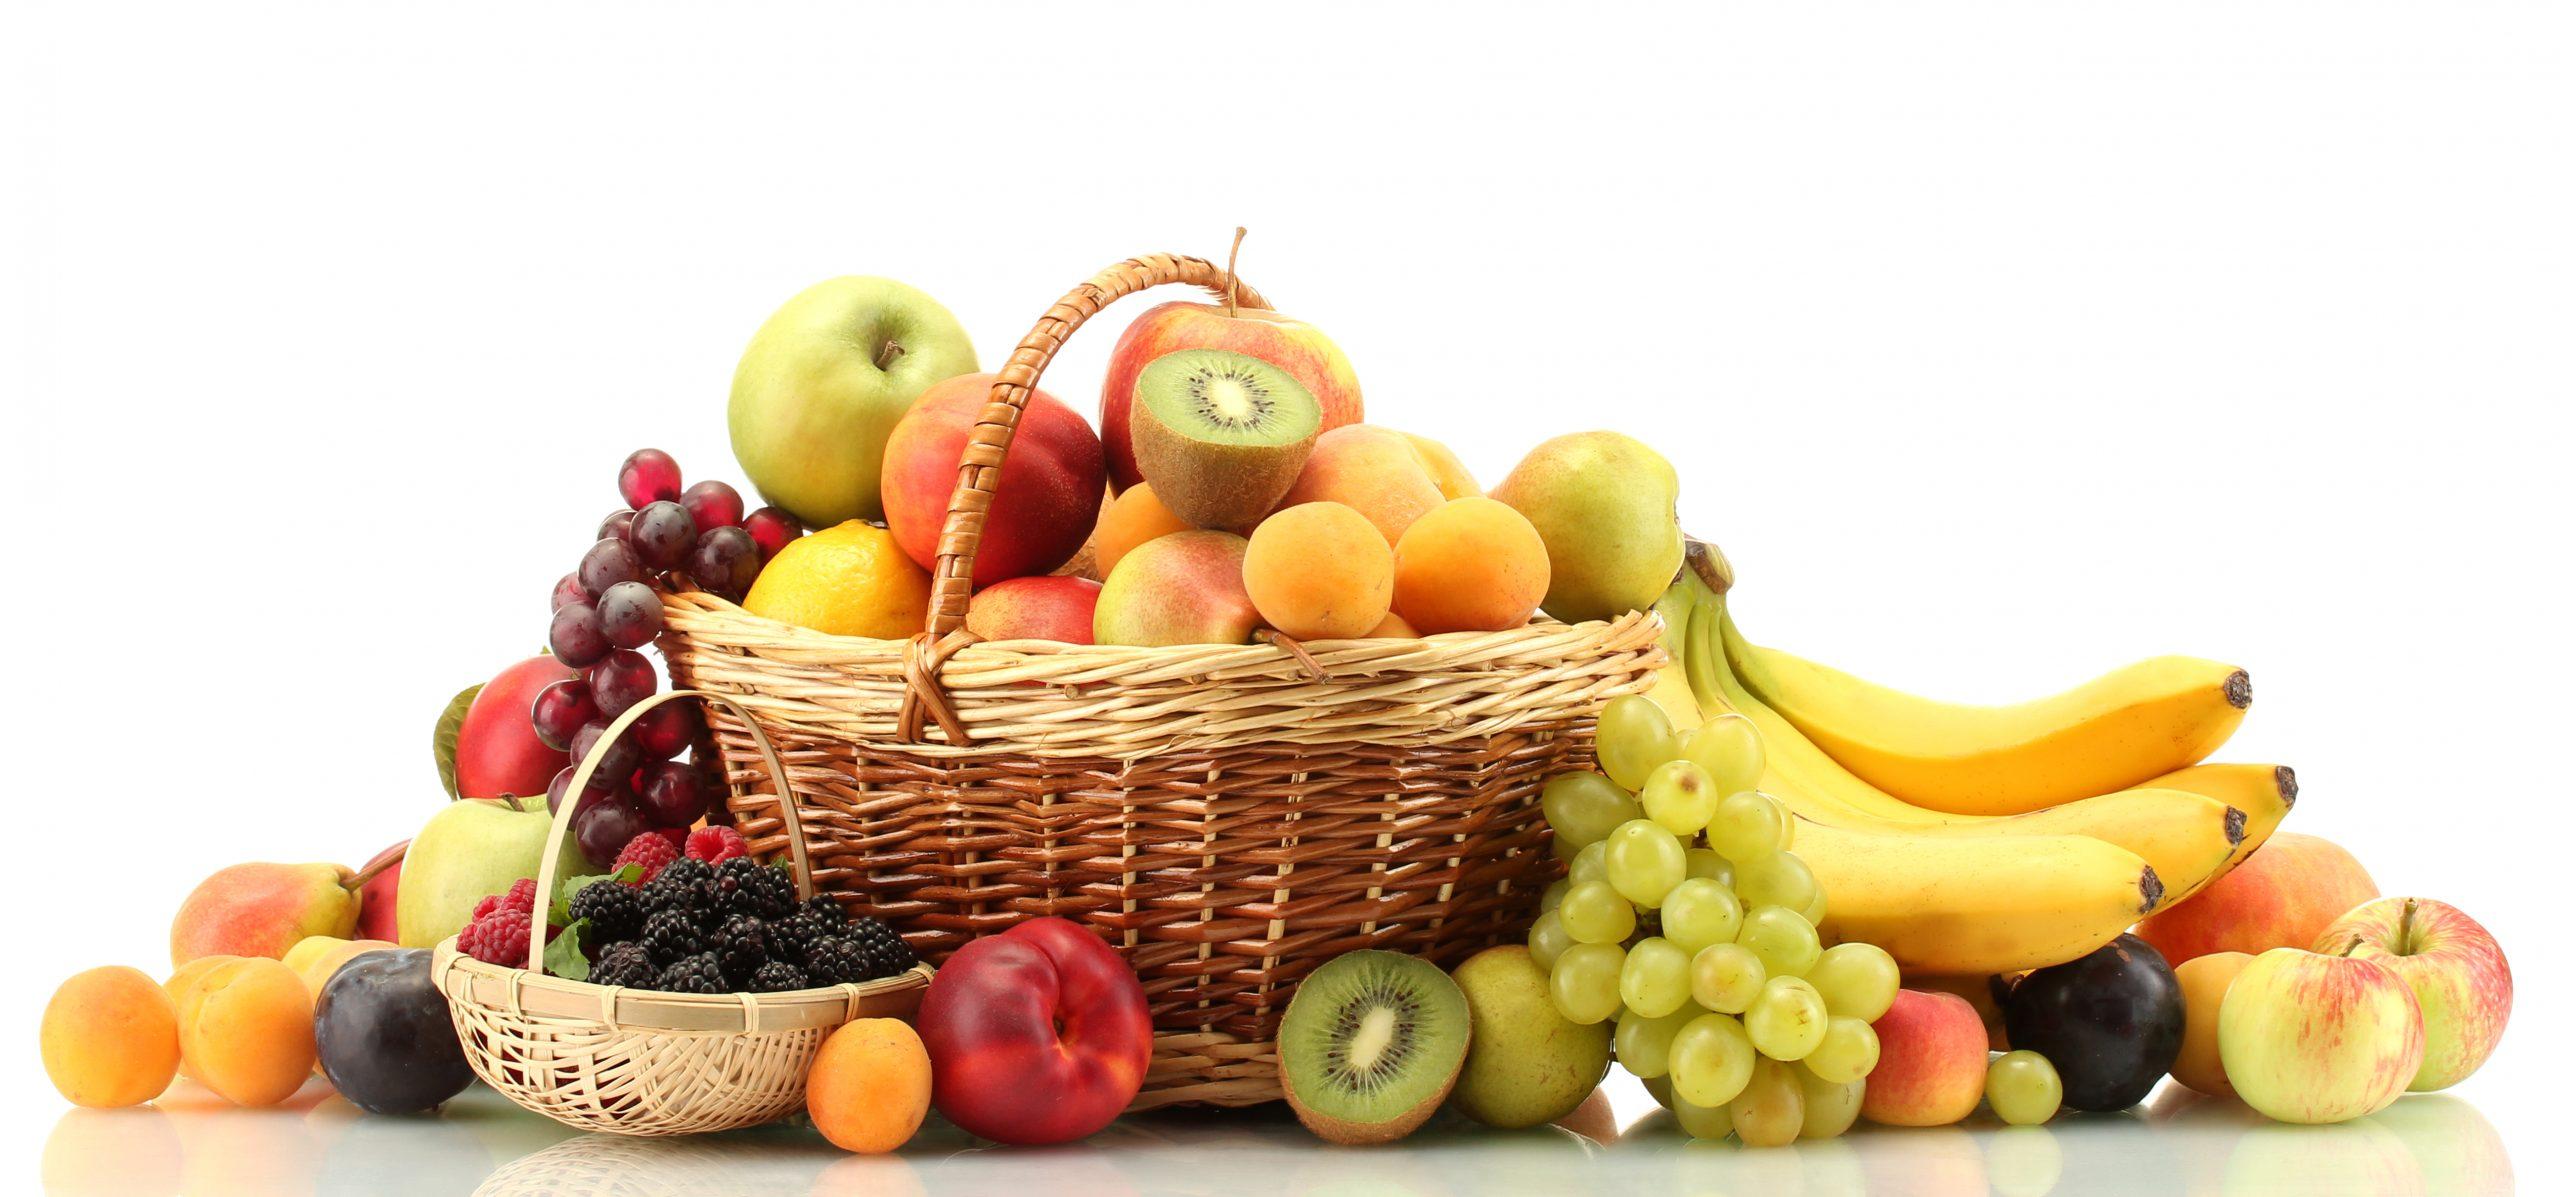 Apple fruit - https://depositphotos.com/25092895/stock-photo-assortment-of-exotic-fruits-and.html